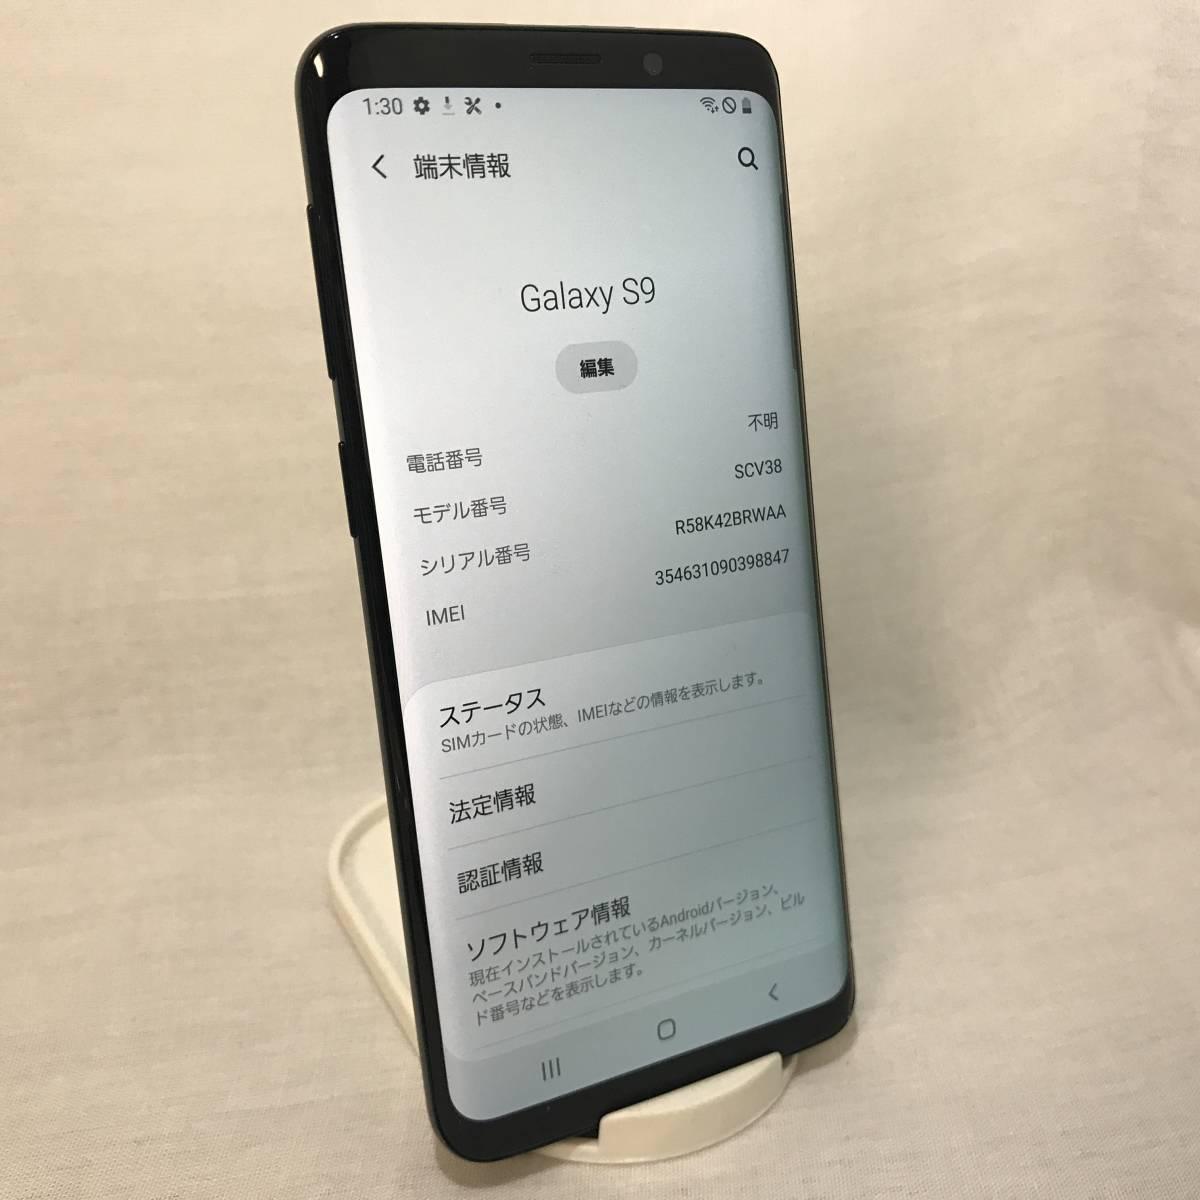 SIMロック解除済み★SAMSUNG au Galaxy S9 SCV38 ミッドナイトブラック 利用制限〇 SIMフリー 送料無料 /YZX3635_画像2